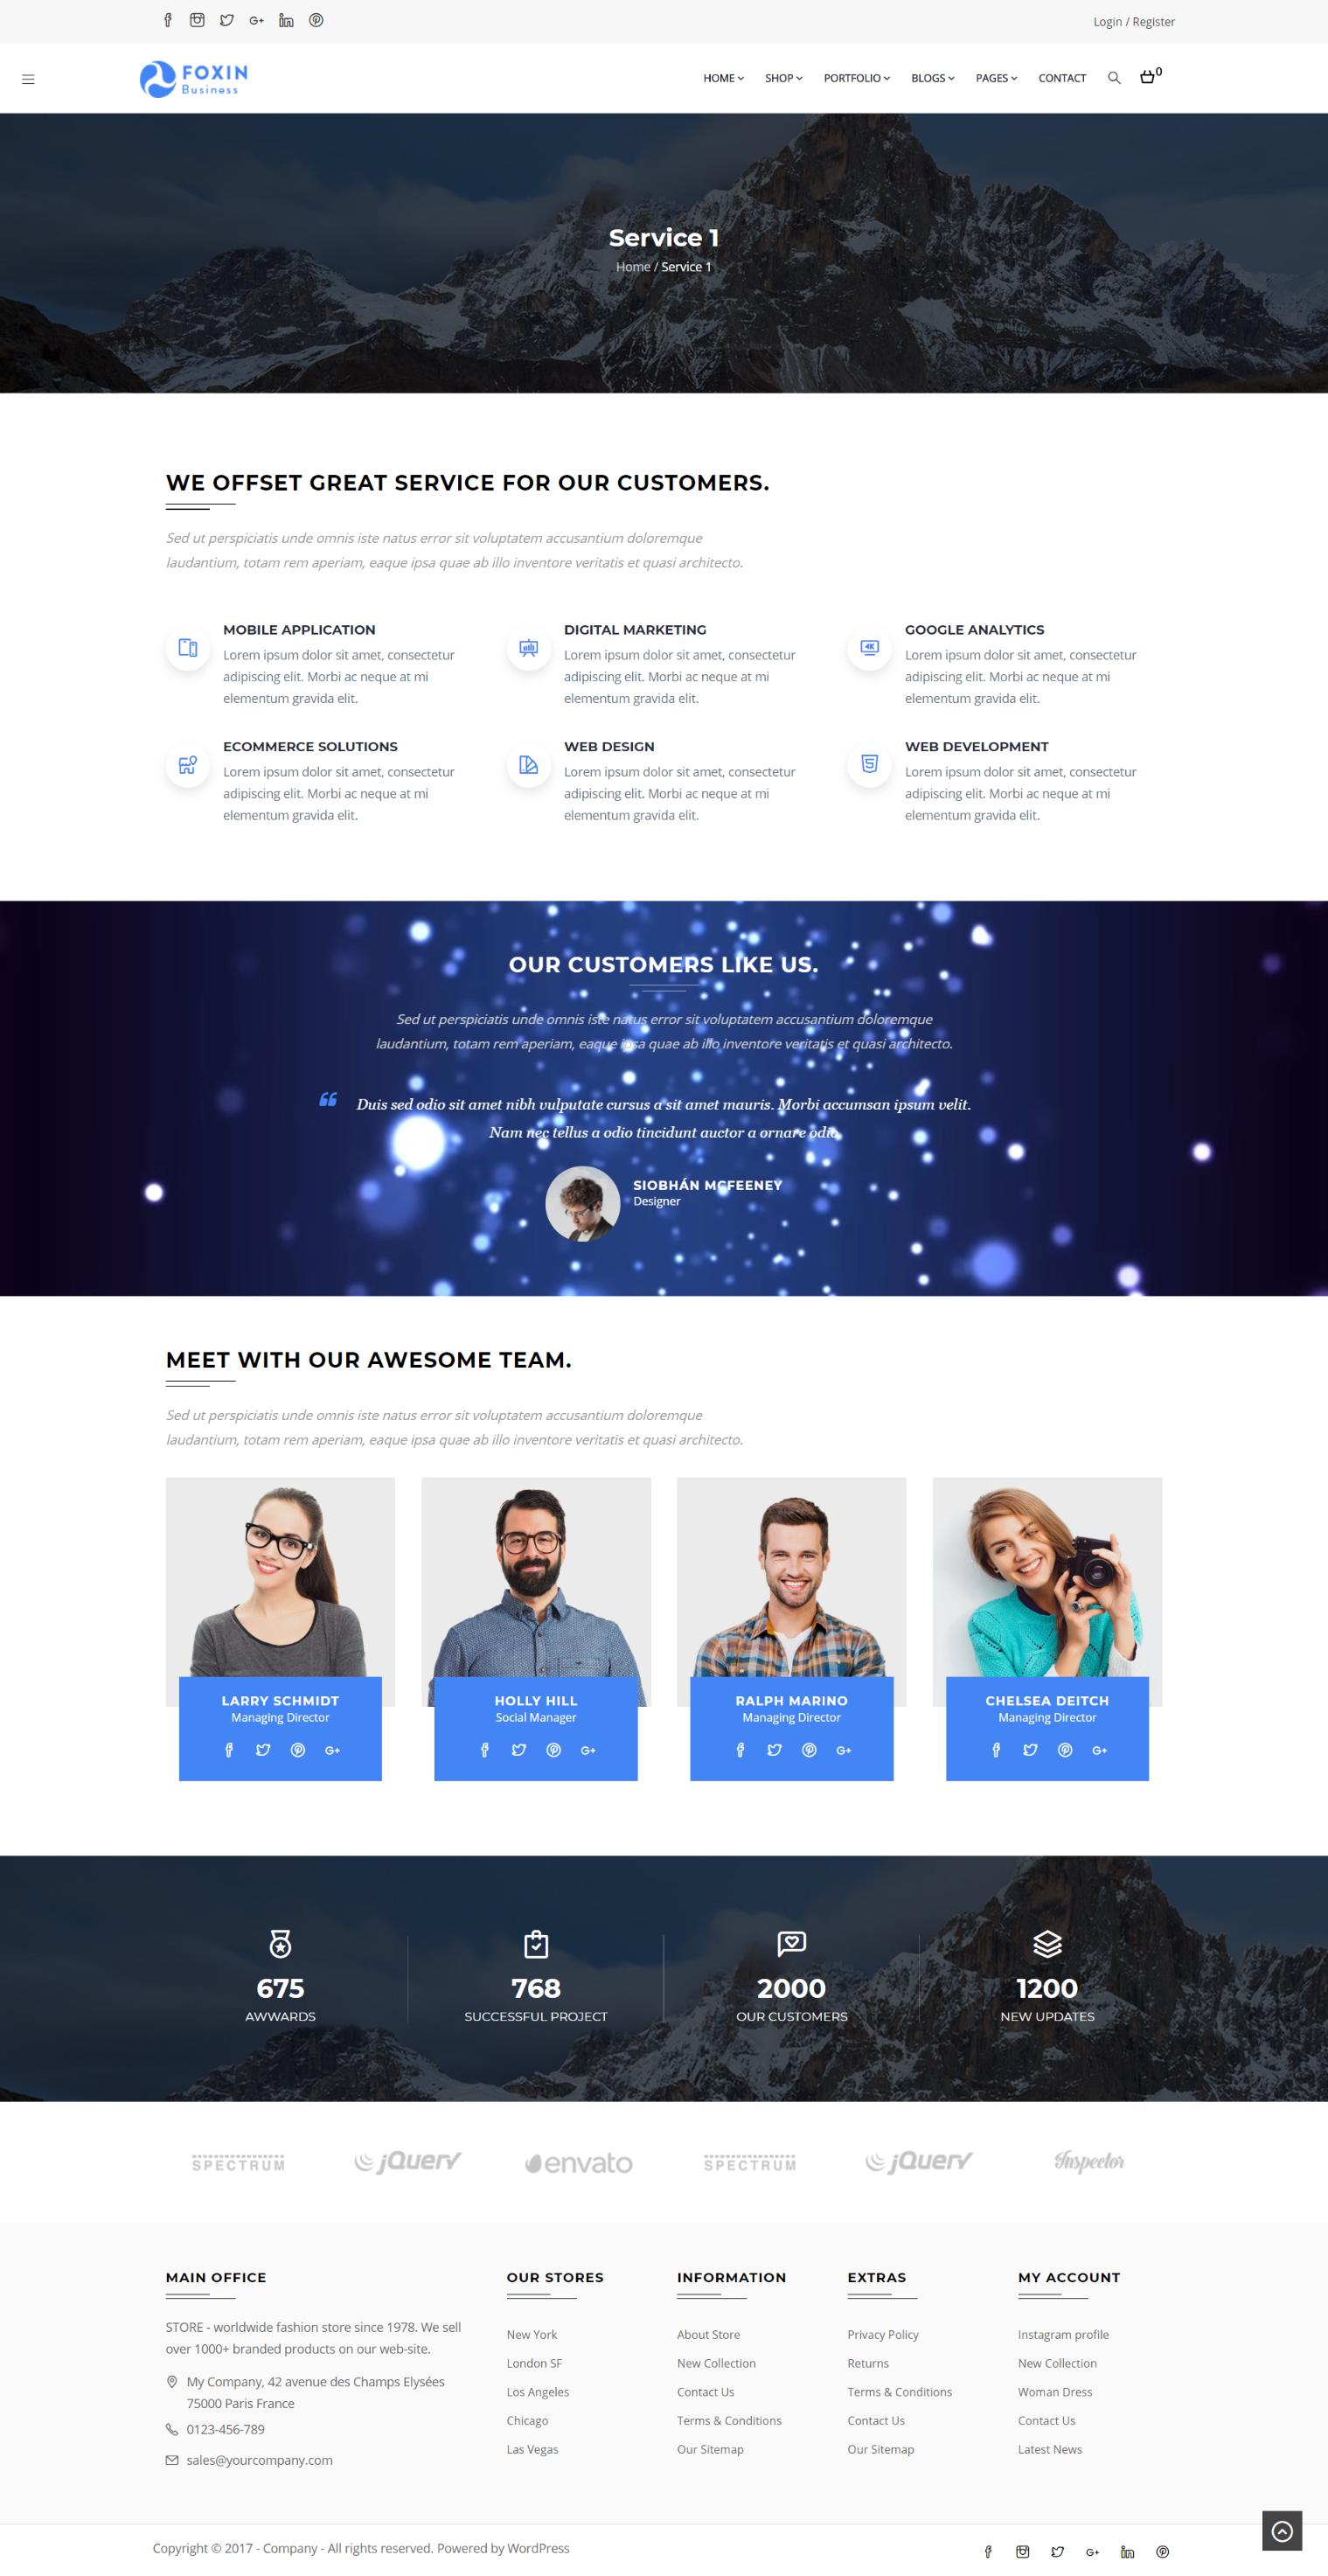 Clean Material Design Service Page Web Design Inspiration Business Wordpress Themes Web Design Inspiration Web Design